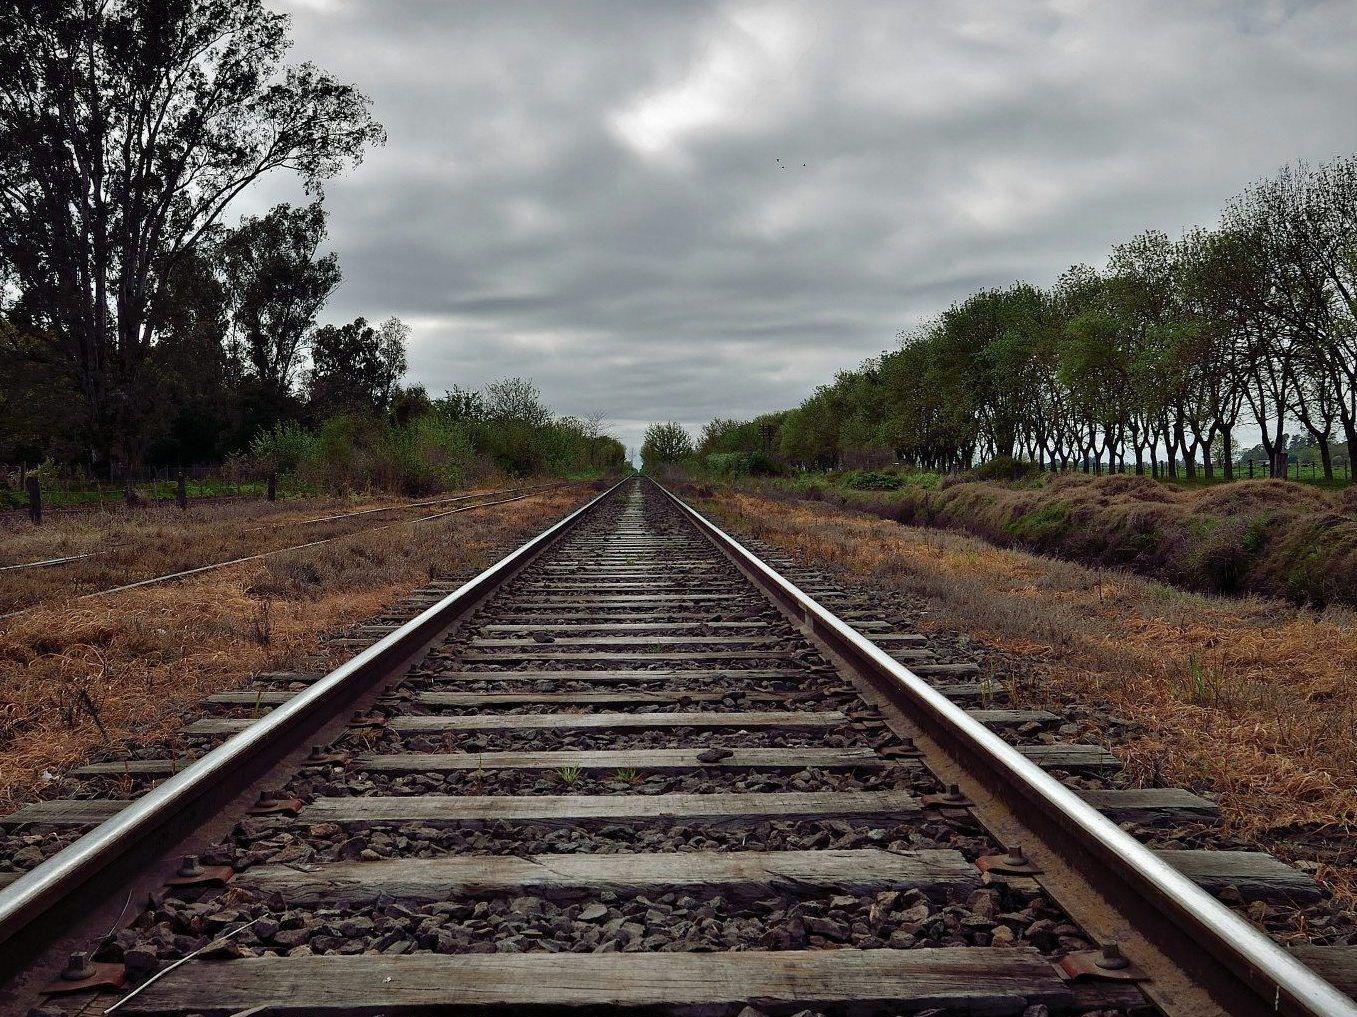 Macri autorizó a Dietrich a levantar vías del ferrocarril